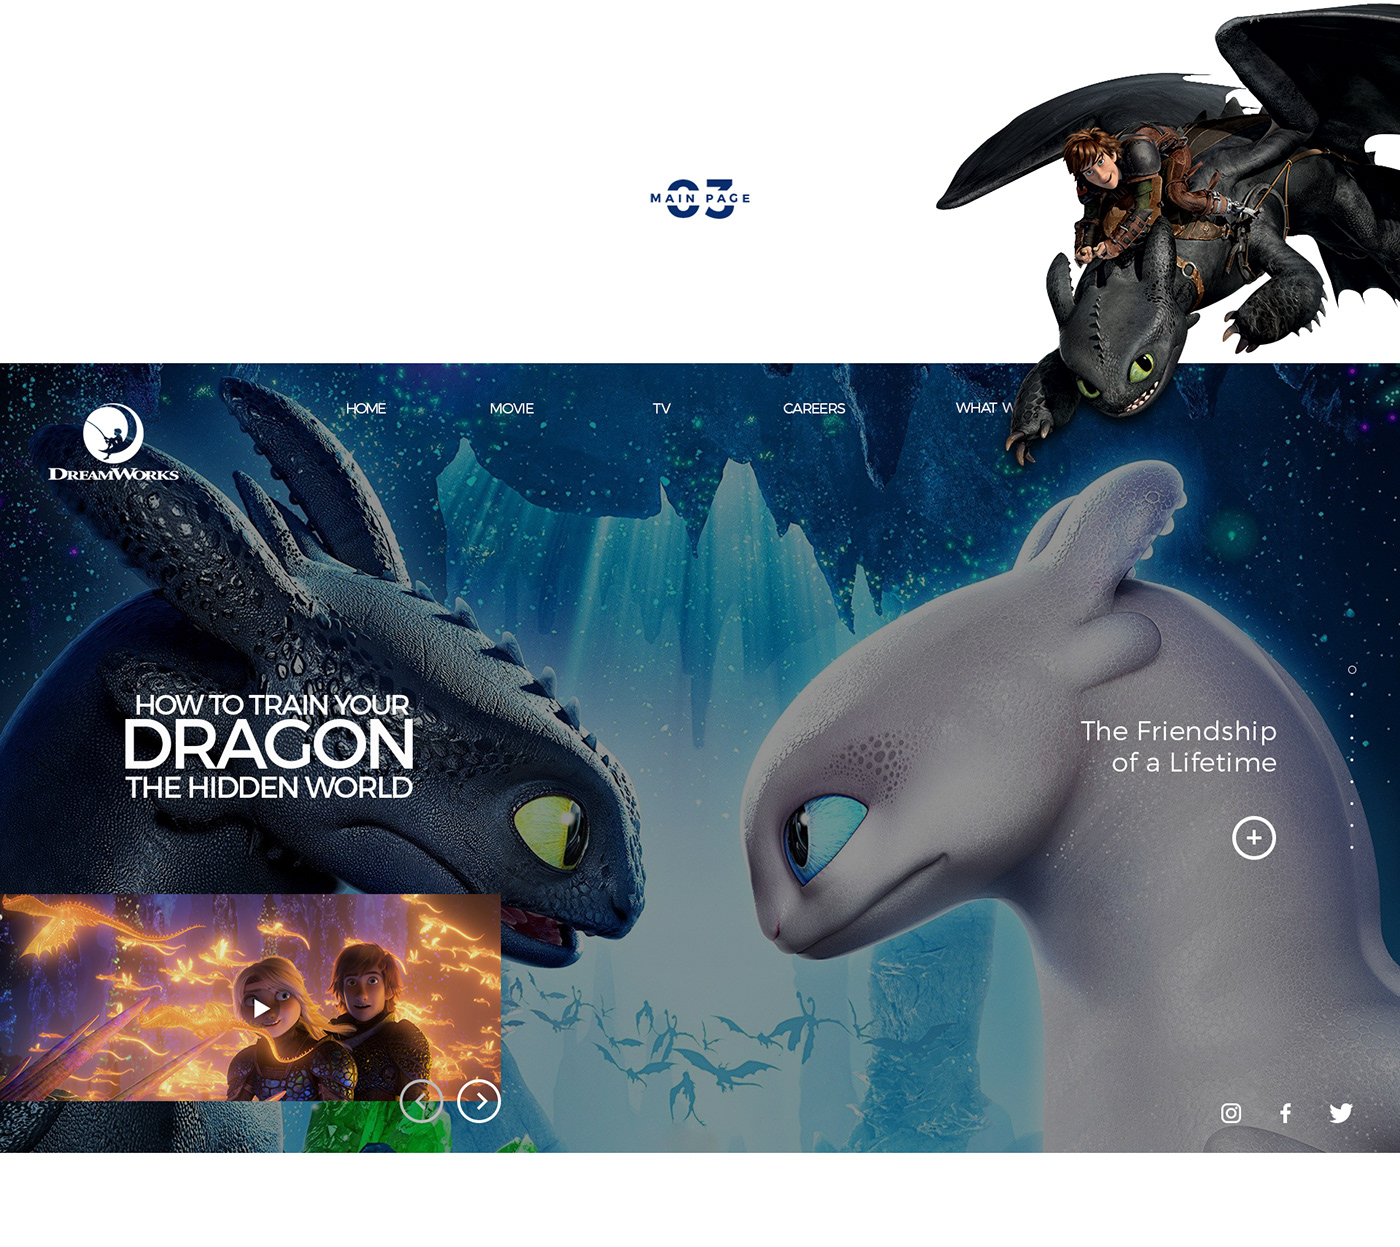 Openhouse Design: Dreamworks Animation Studios Interaction Design On Behance